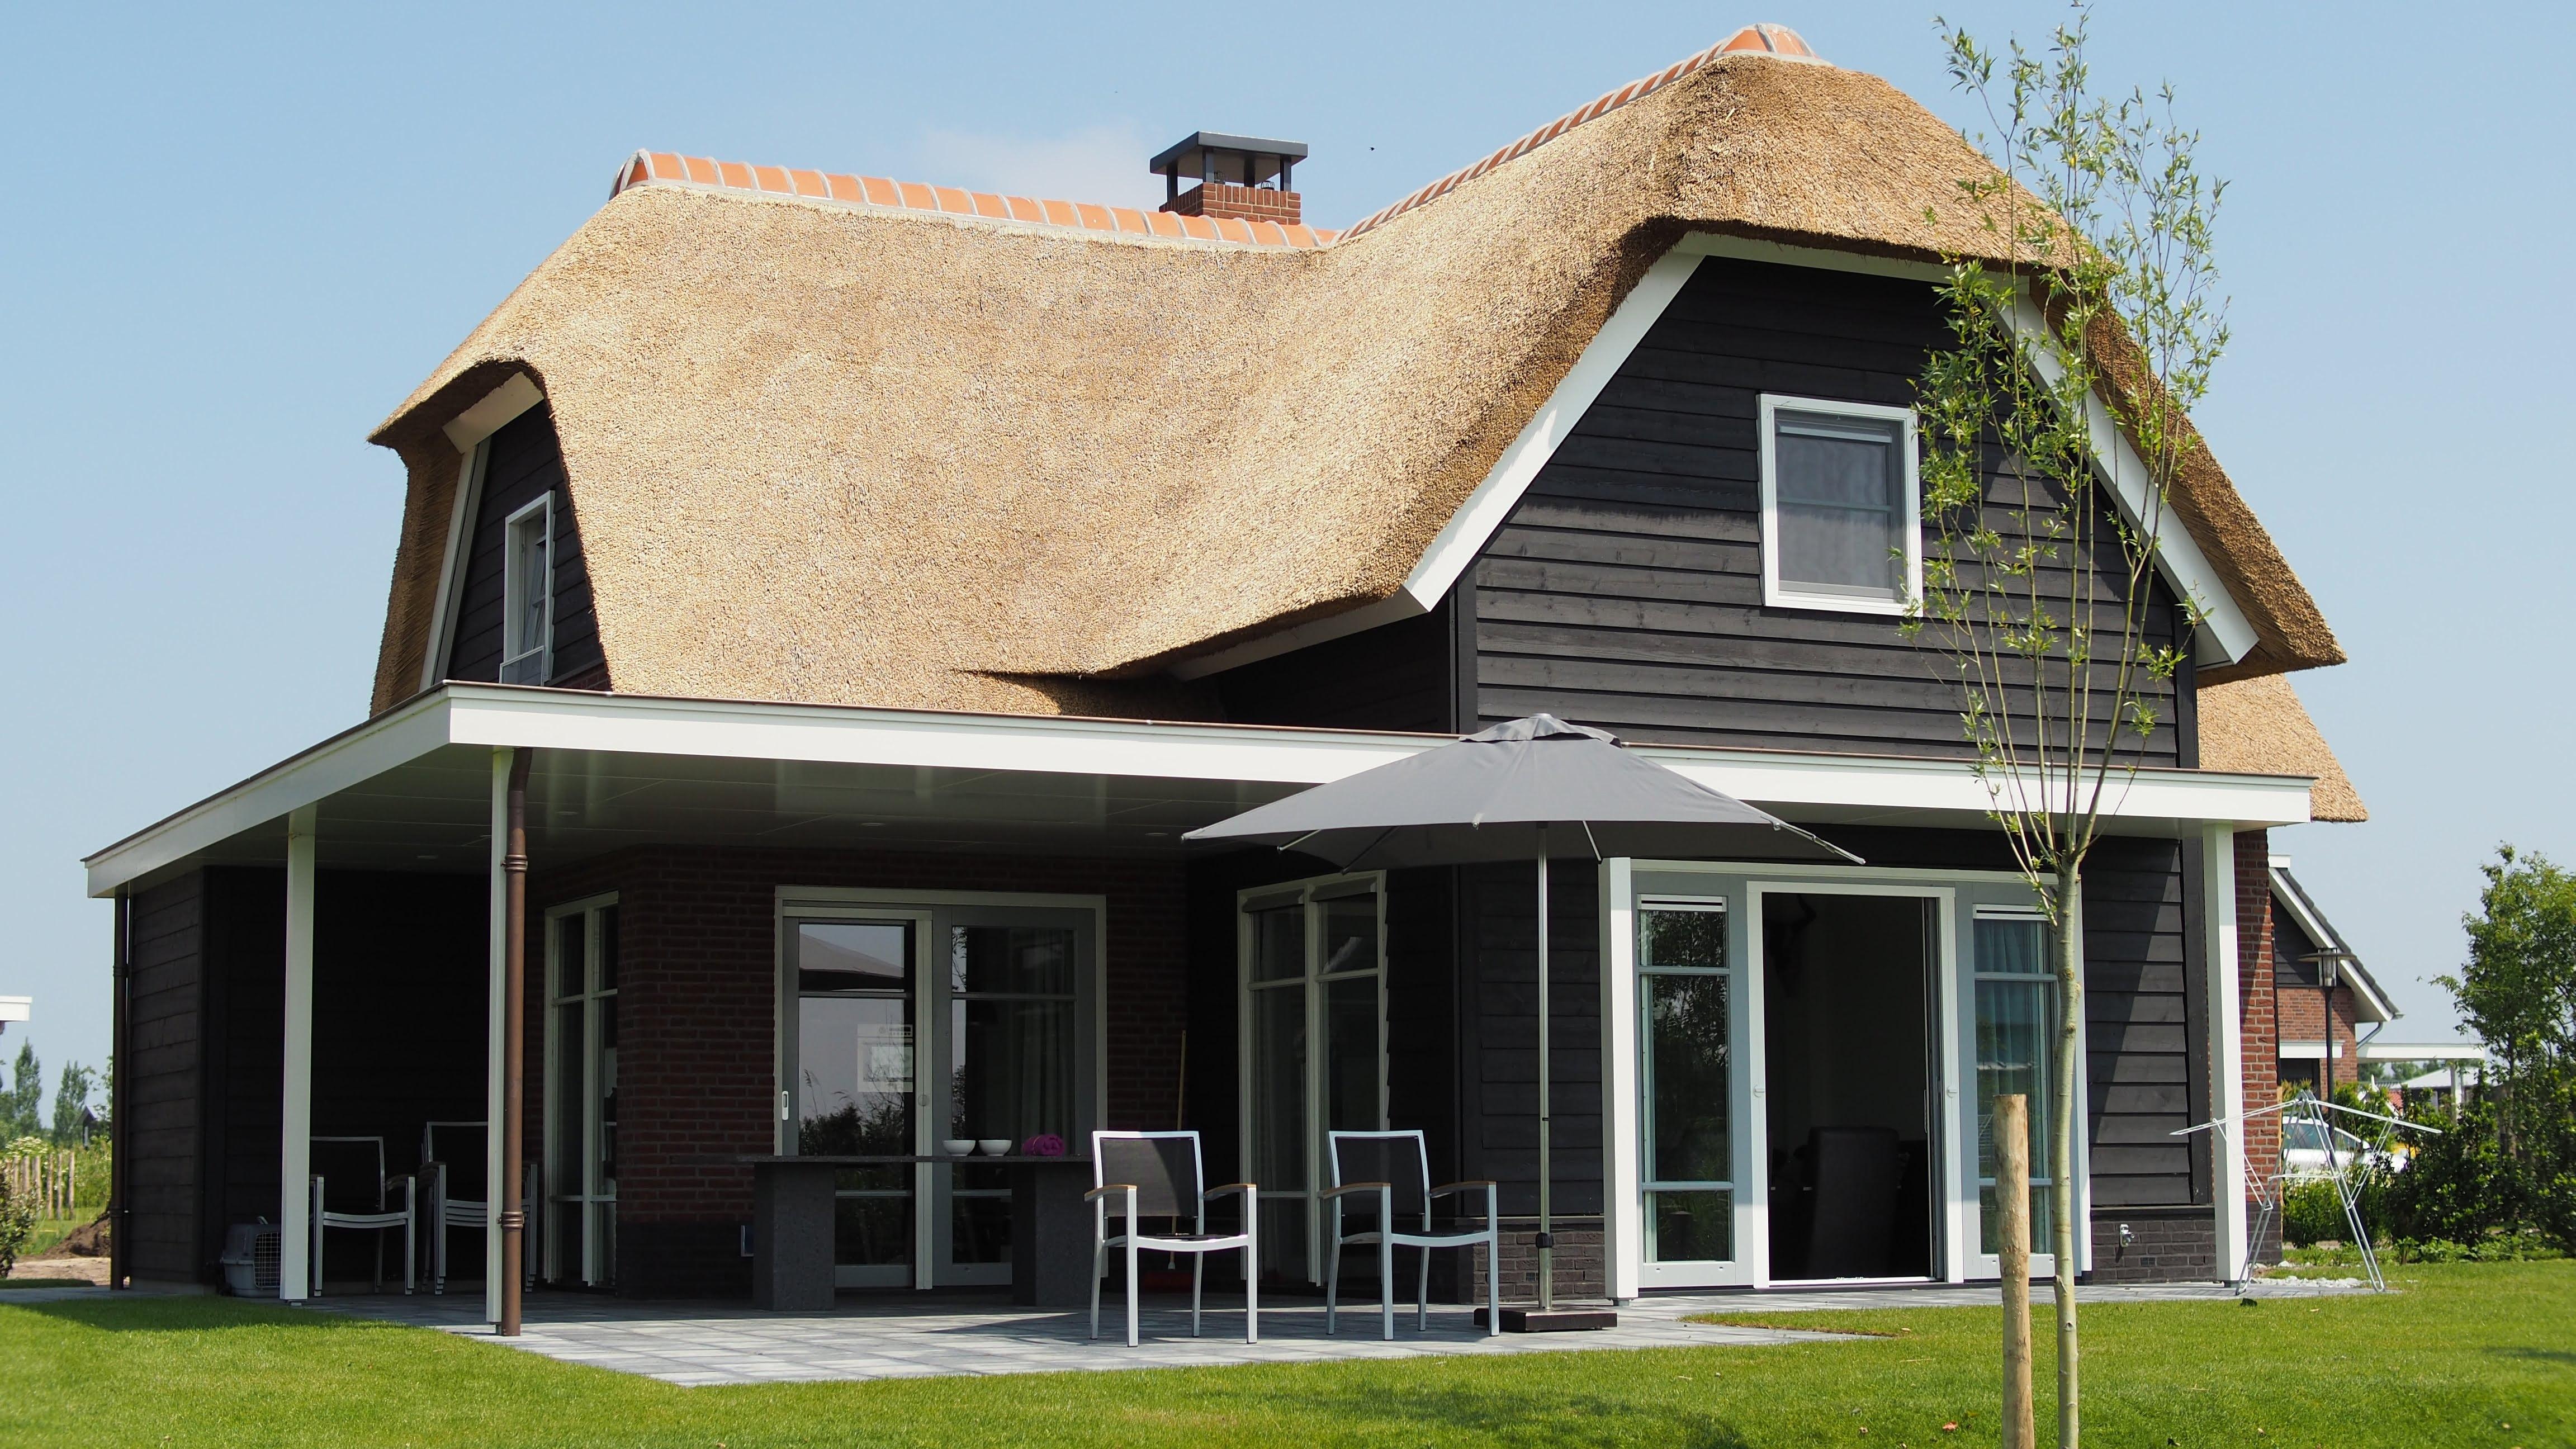 Kosten Badkamer Hypotheek : Bouwdepot archieven